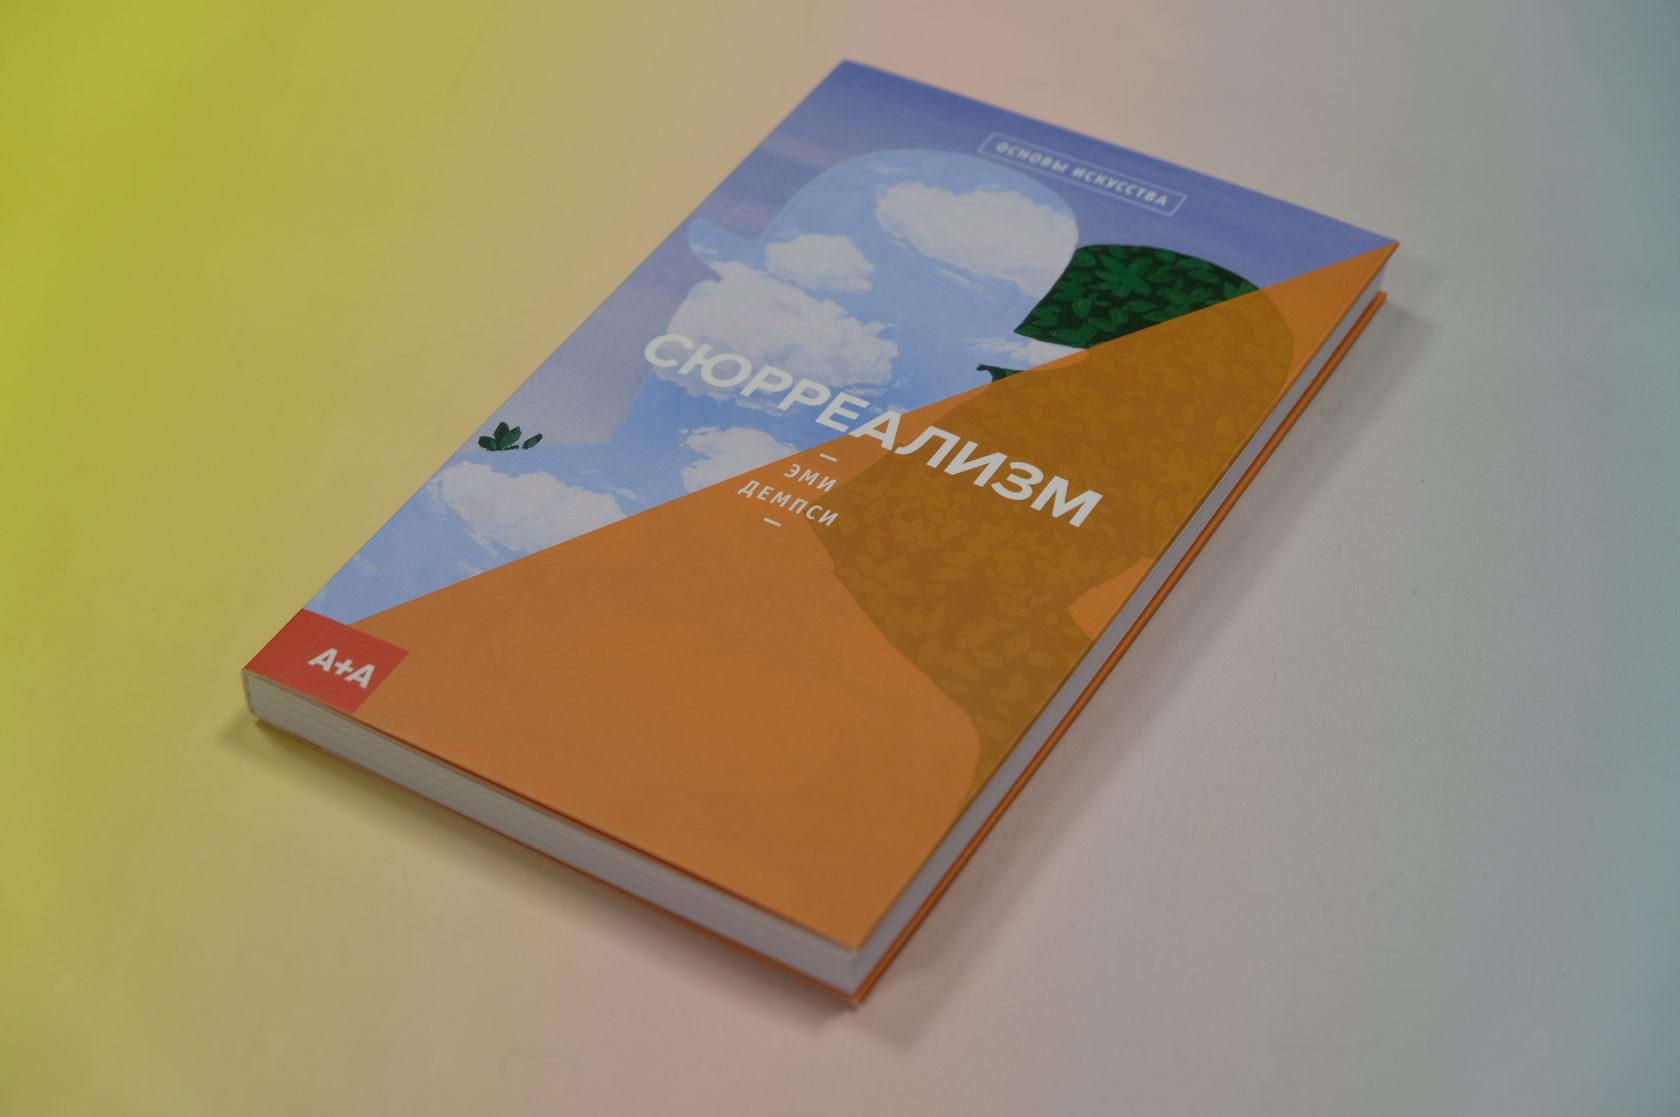 Купить книгу «Сюрреализм» Эми Демпси 978-5-91103-444-3